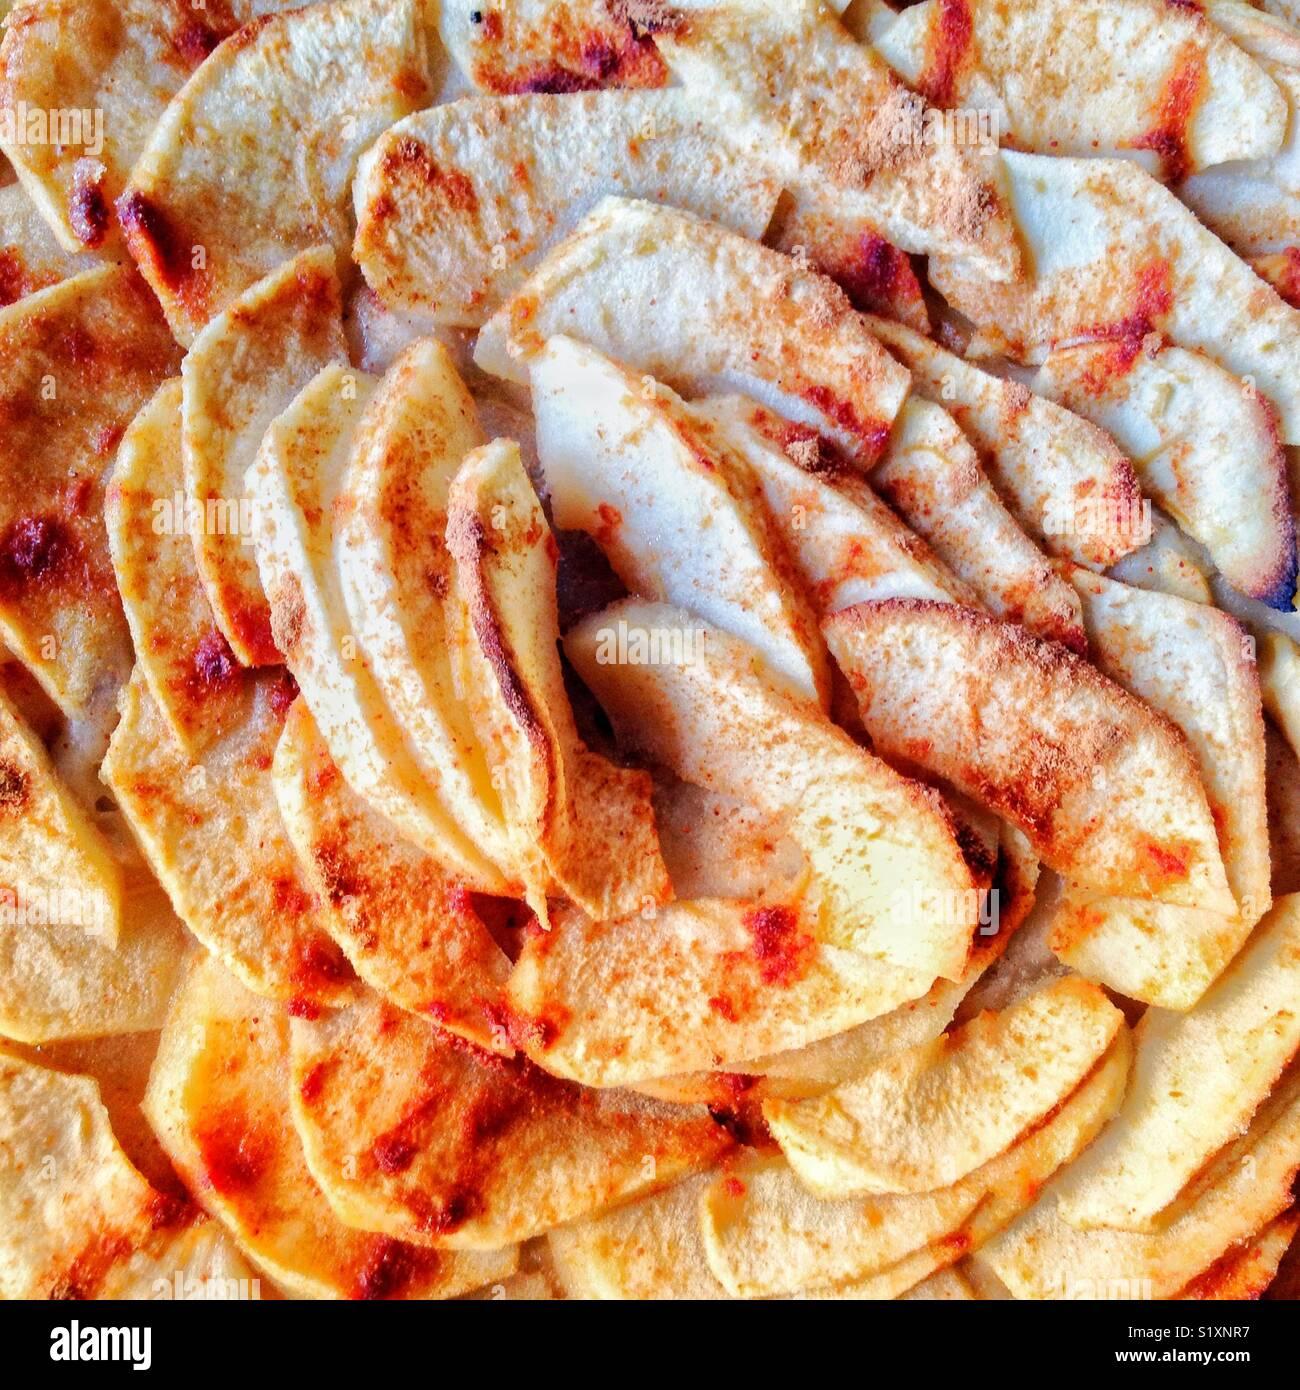 Apple pie gluten free home made - Stock Image